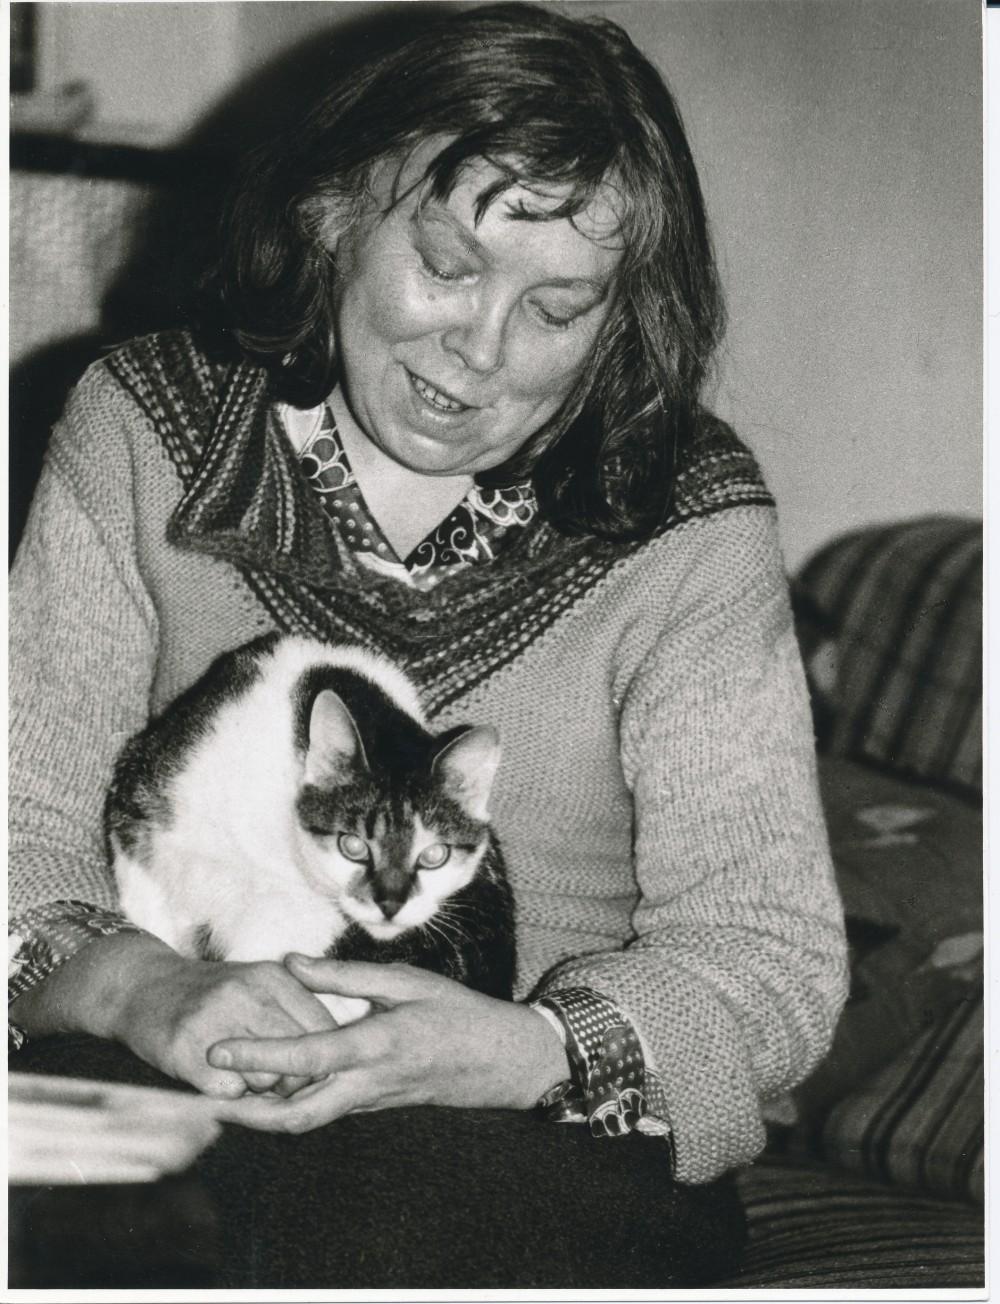 Su katyte Kleopatra Vilniuje 1985 m. Fotografė O. Pajedaitė